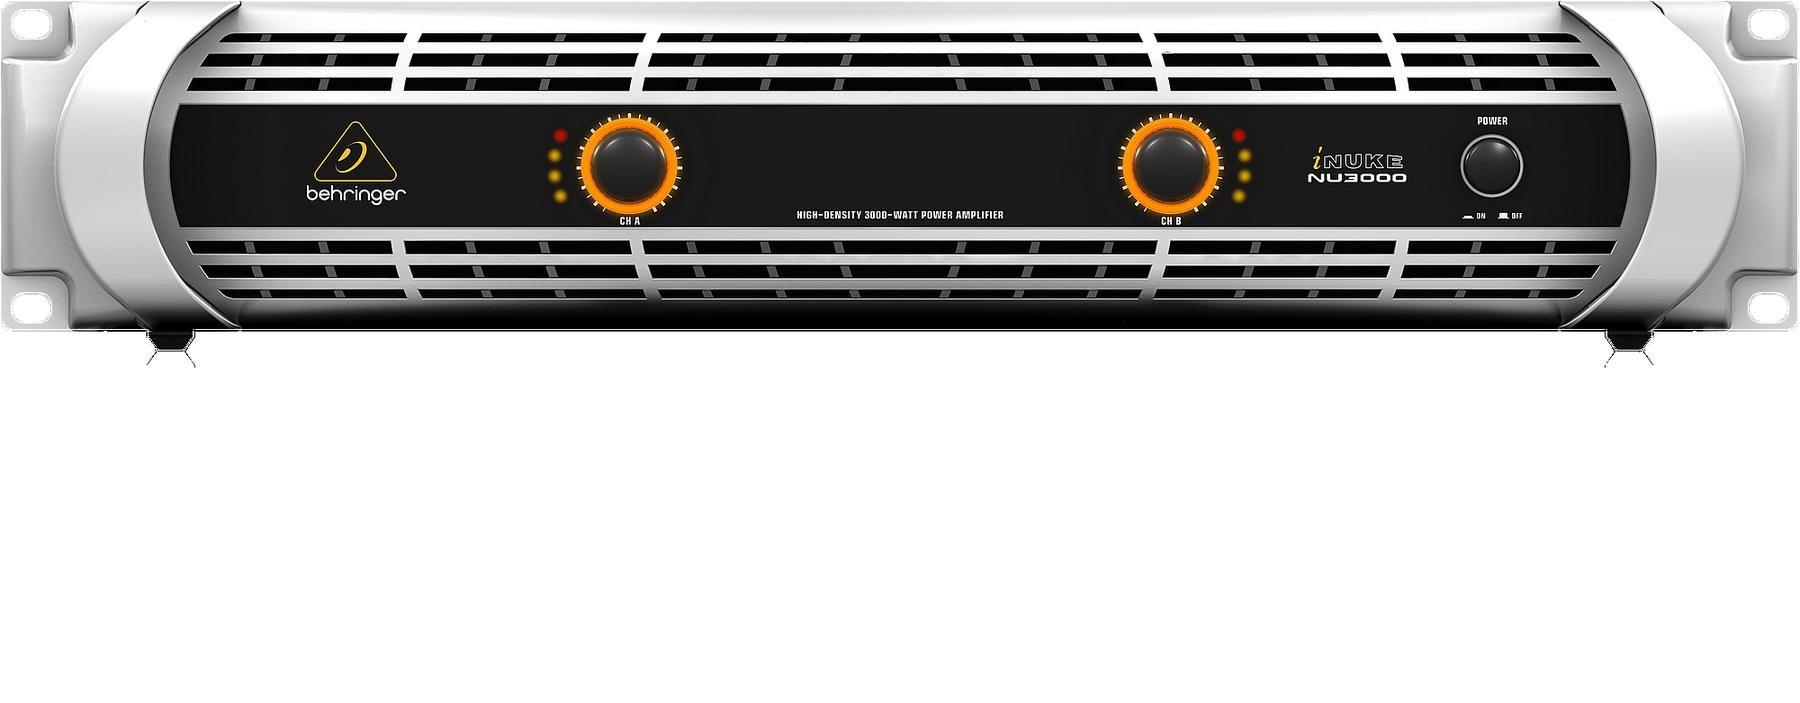 Behringer Inuke Nu3000 Power Amplifier Sweetwater 500w Circuit Diagrams 2000 Watt Image 1